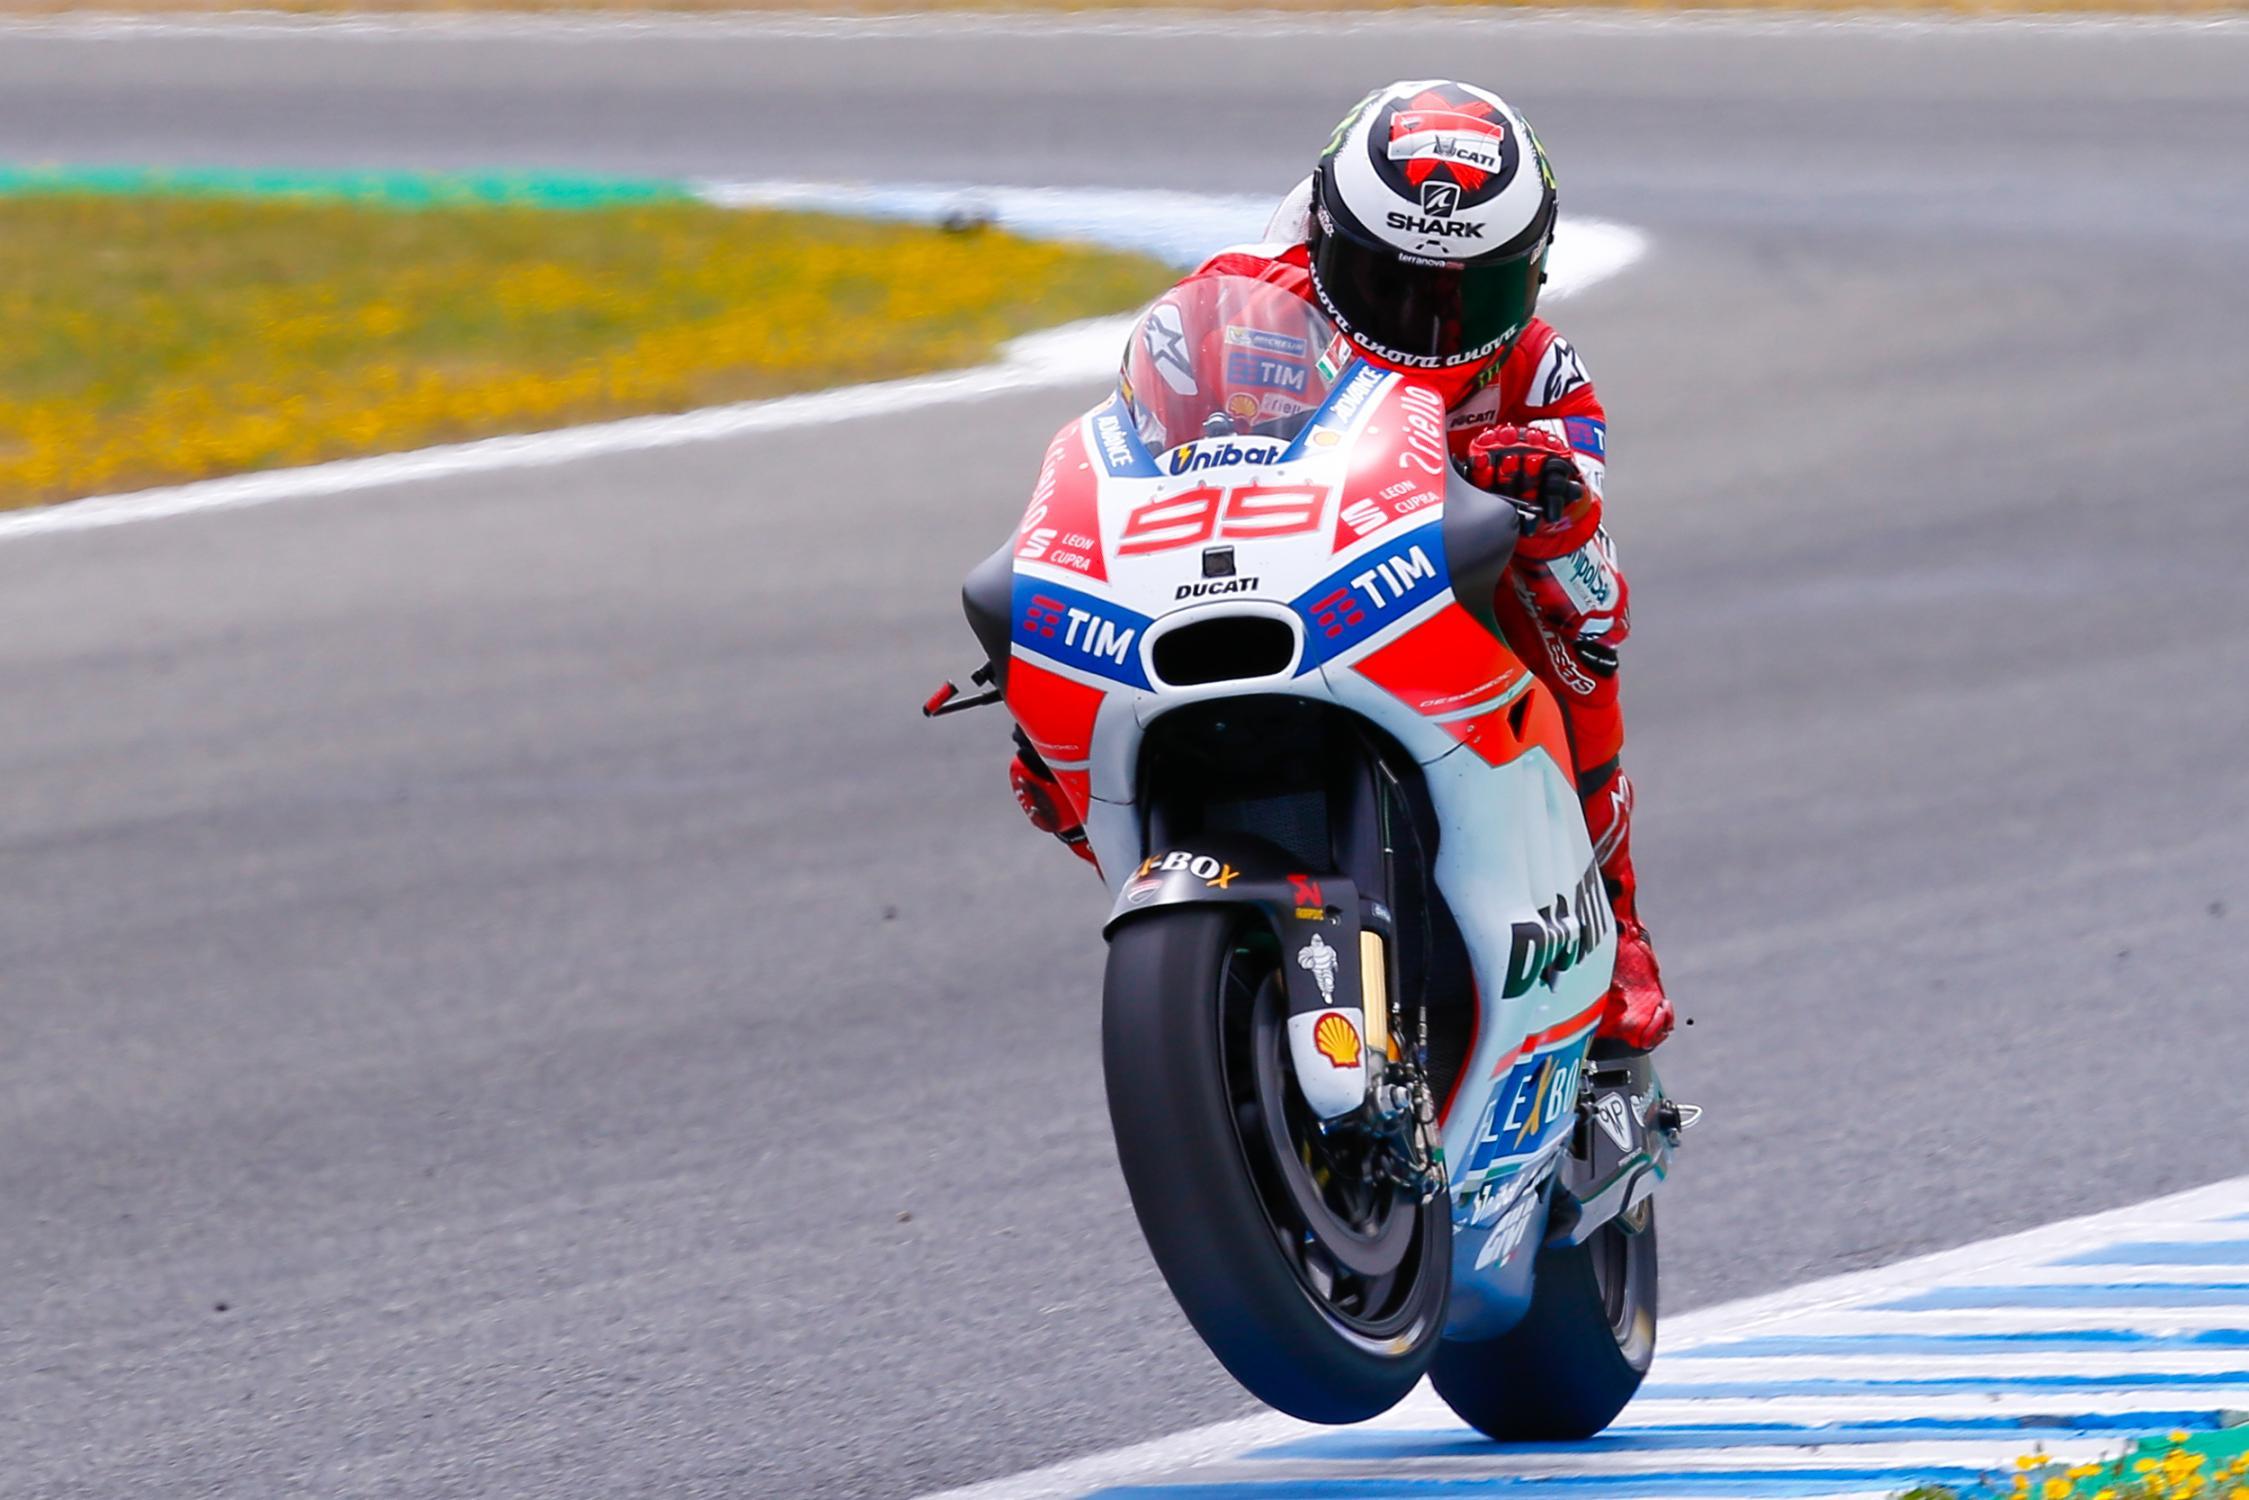 [GP] Jerez 99-jorge-lorenzo-esp05981_gpjerez_motogp_action_0.gallery_full_top_fullscreen